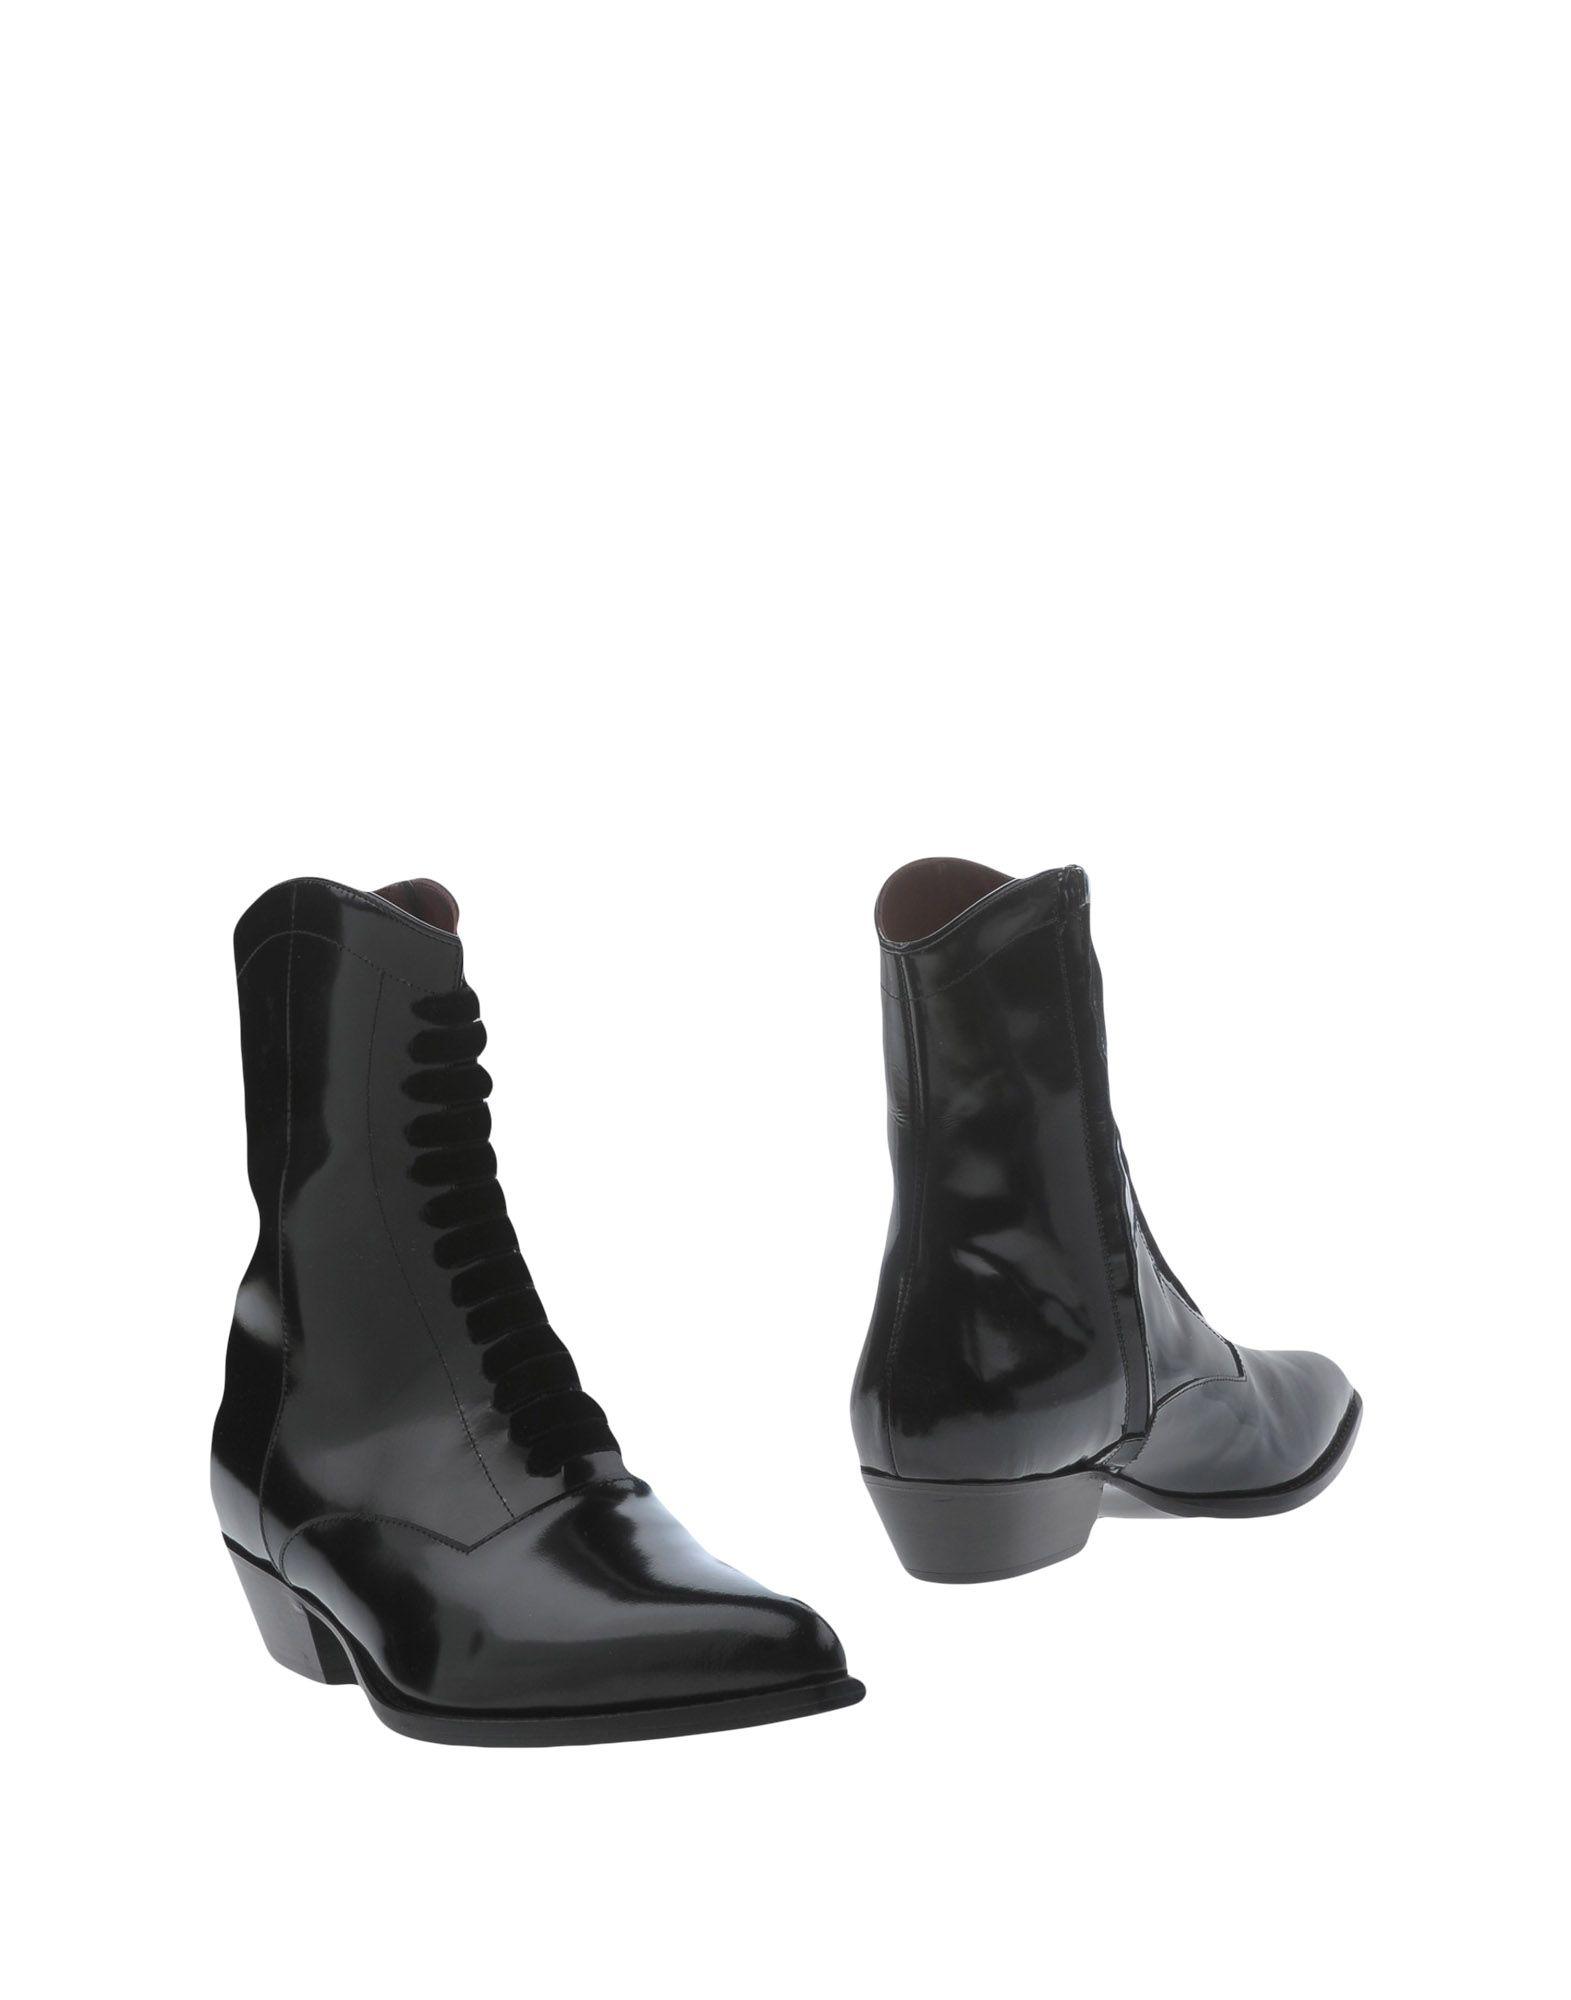 PHILOSOPHY di LORENZO SERAFINI Полусапоги и высокие ботинки цены онлайн